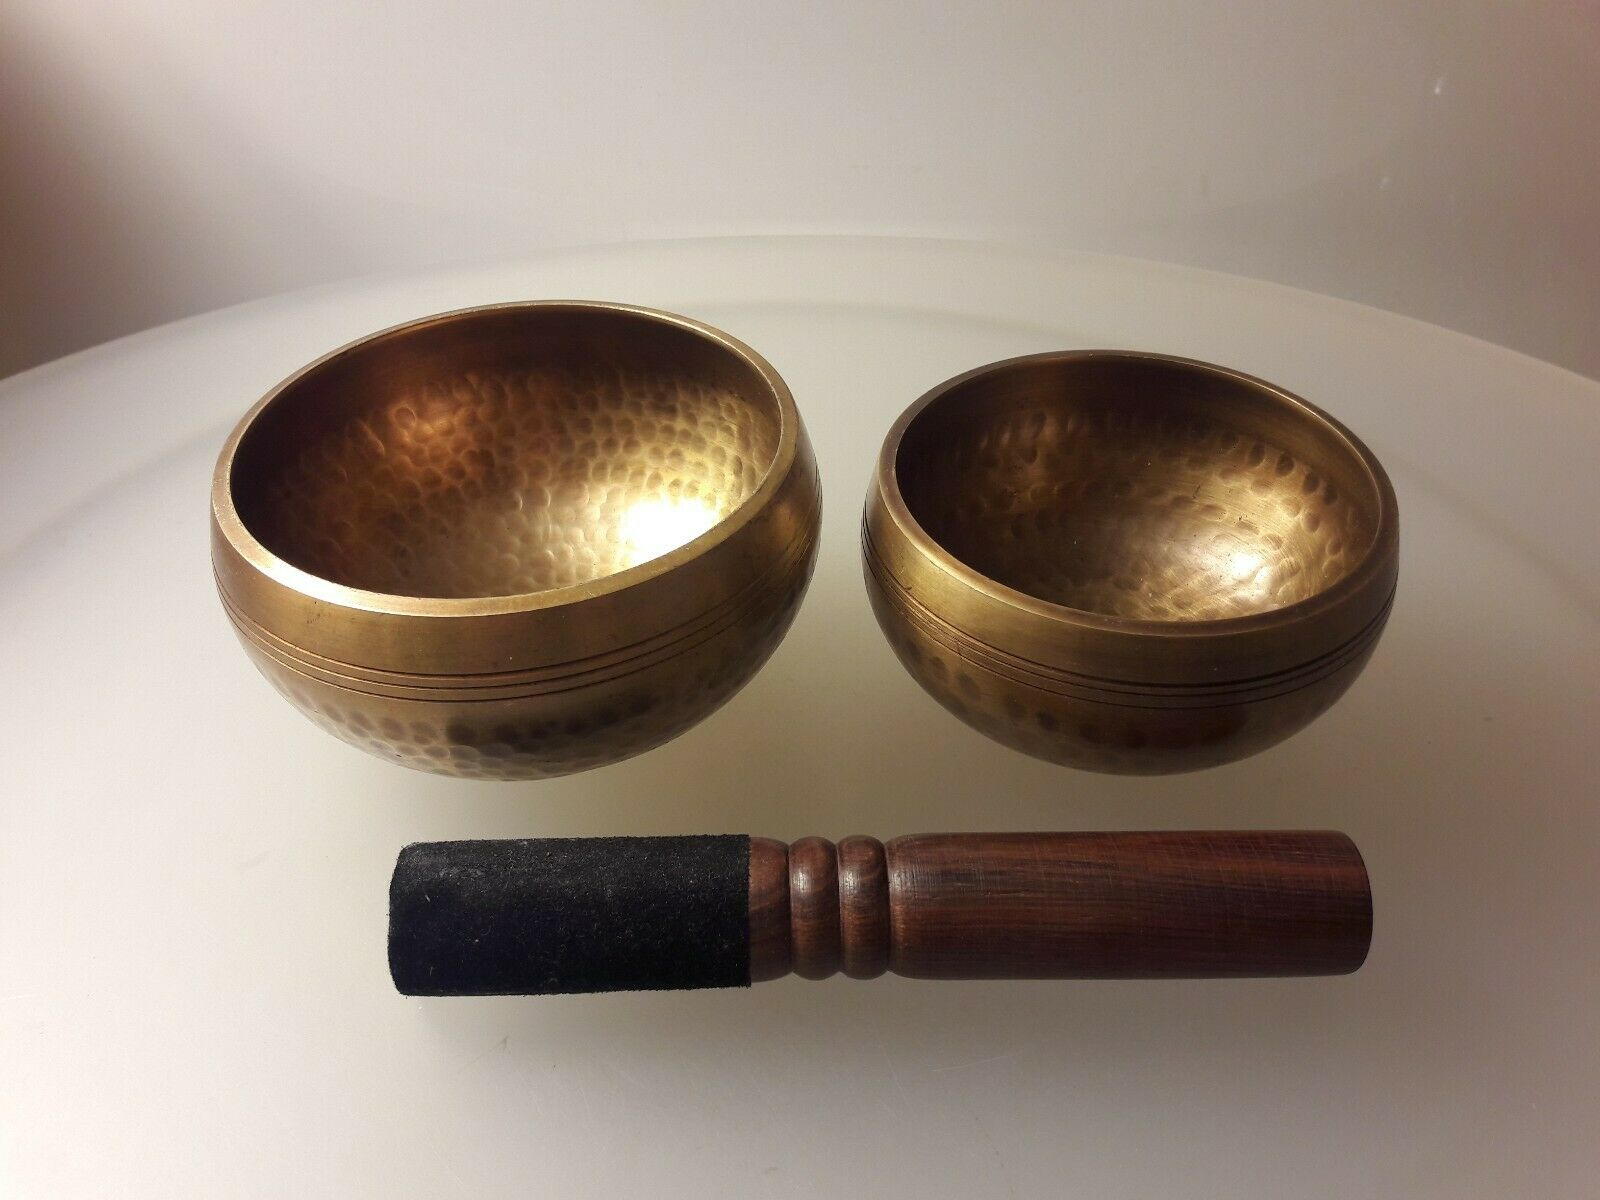 2 Gehämmerte klangschalen Singing Bowls Nepal 1050gram mit Klöppel